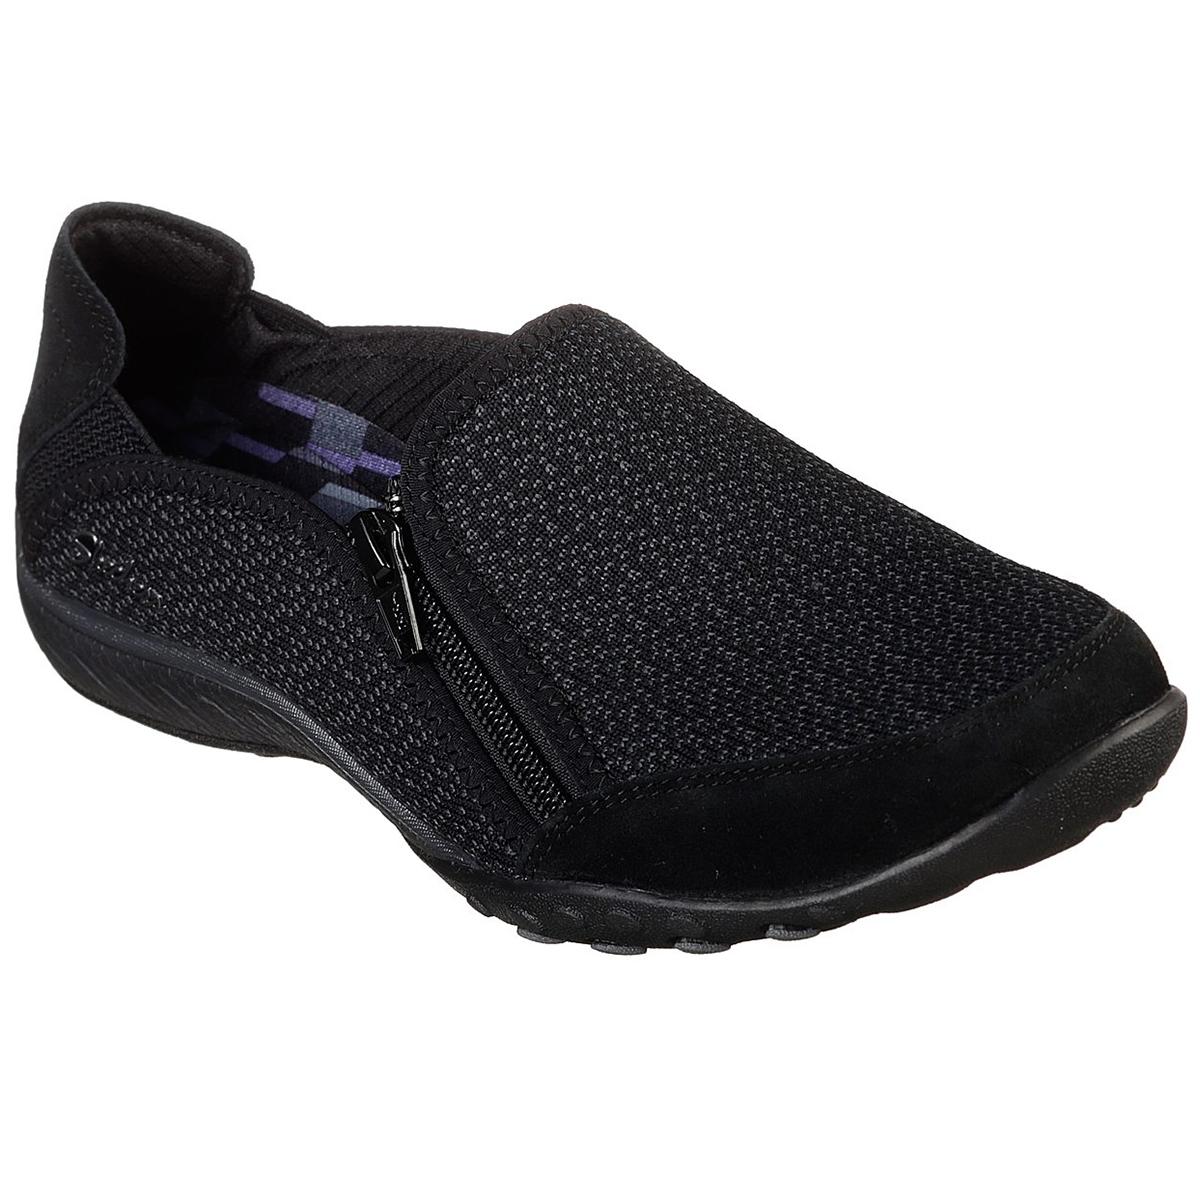 Skechers Women's Relaxed Fit: Breathe Easy - Quiet-Tude Sneakers - Black, 6.5